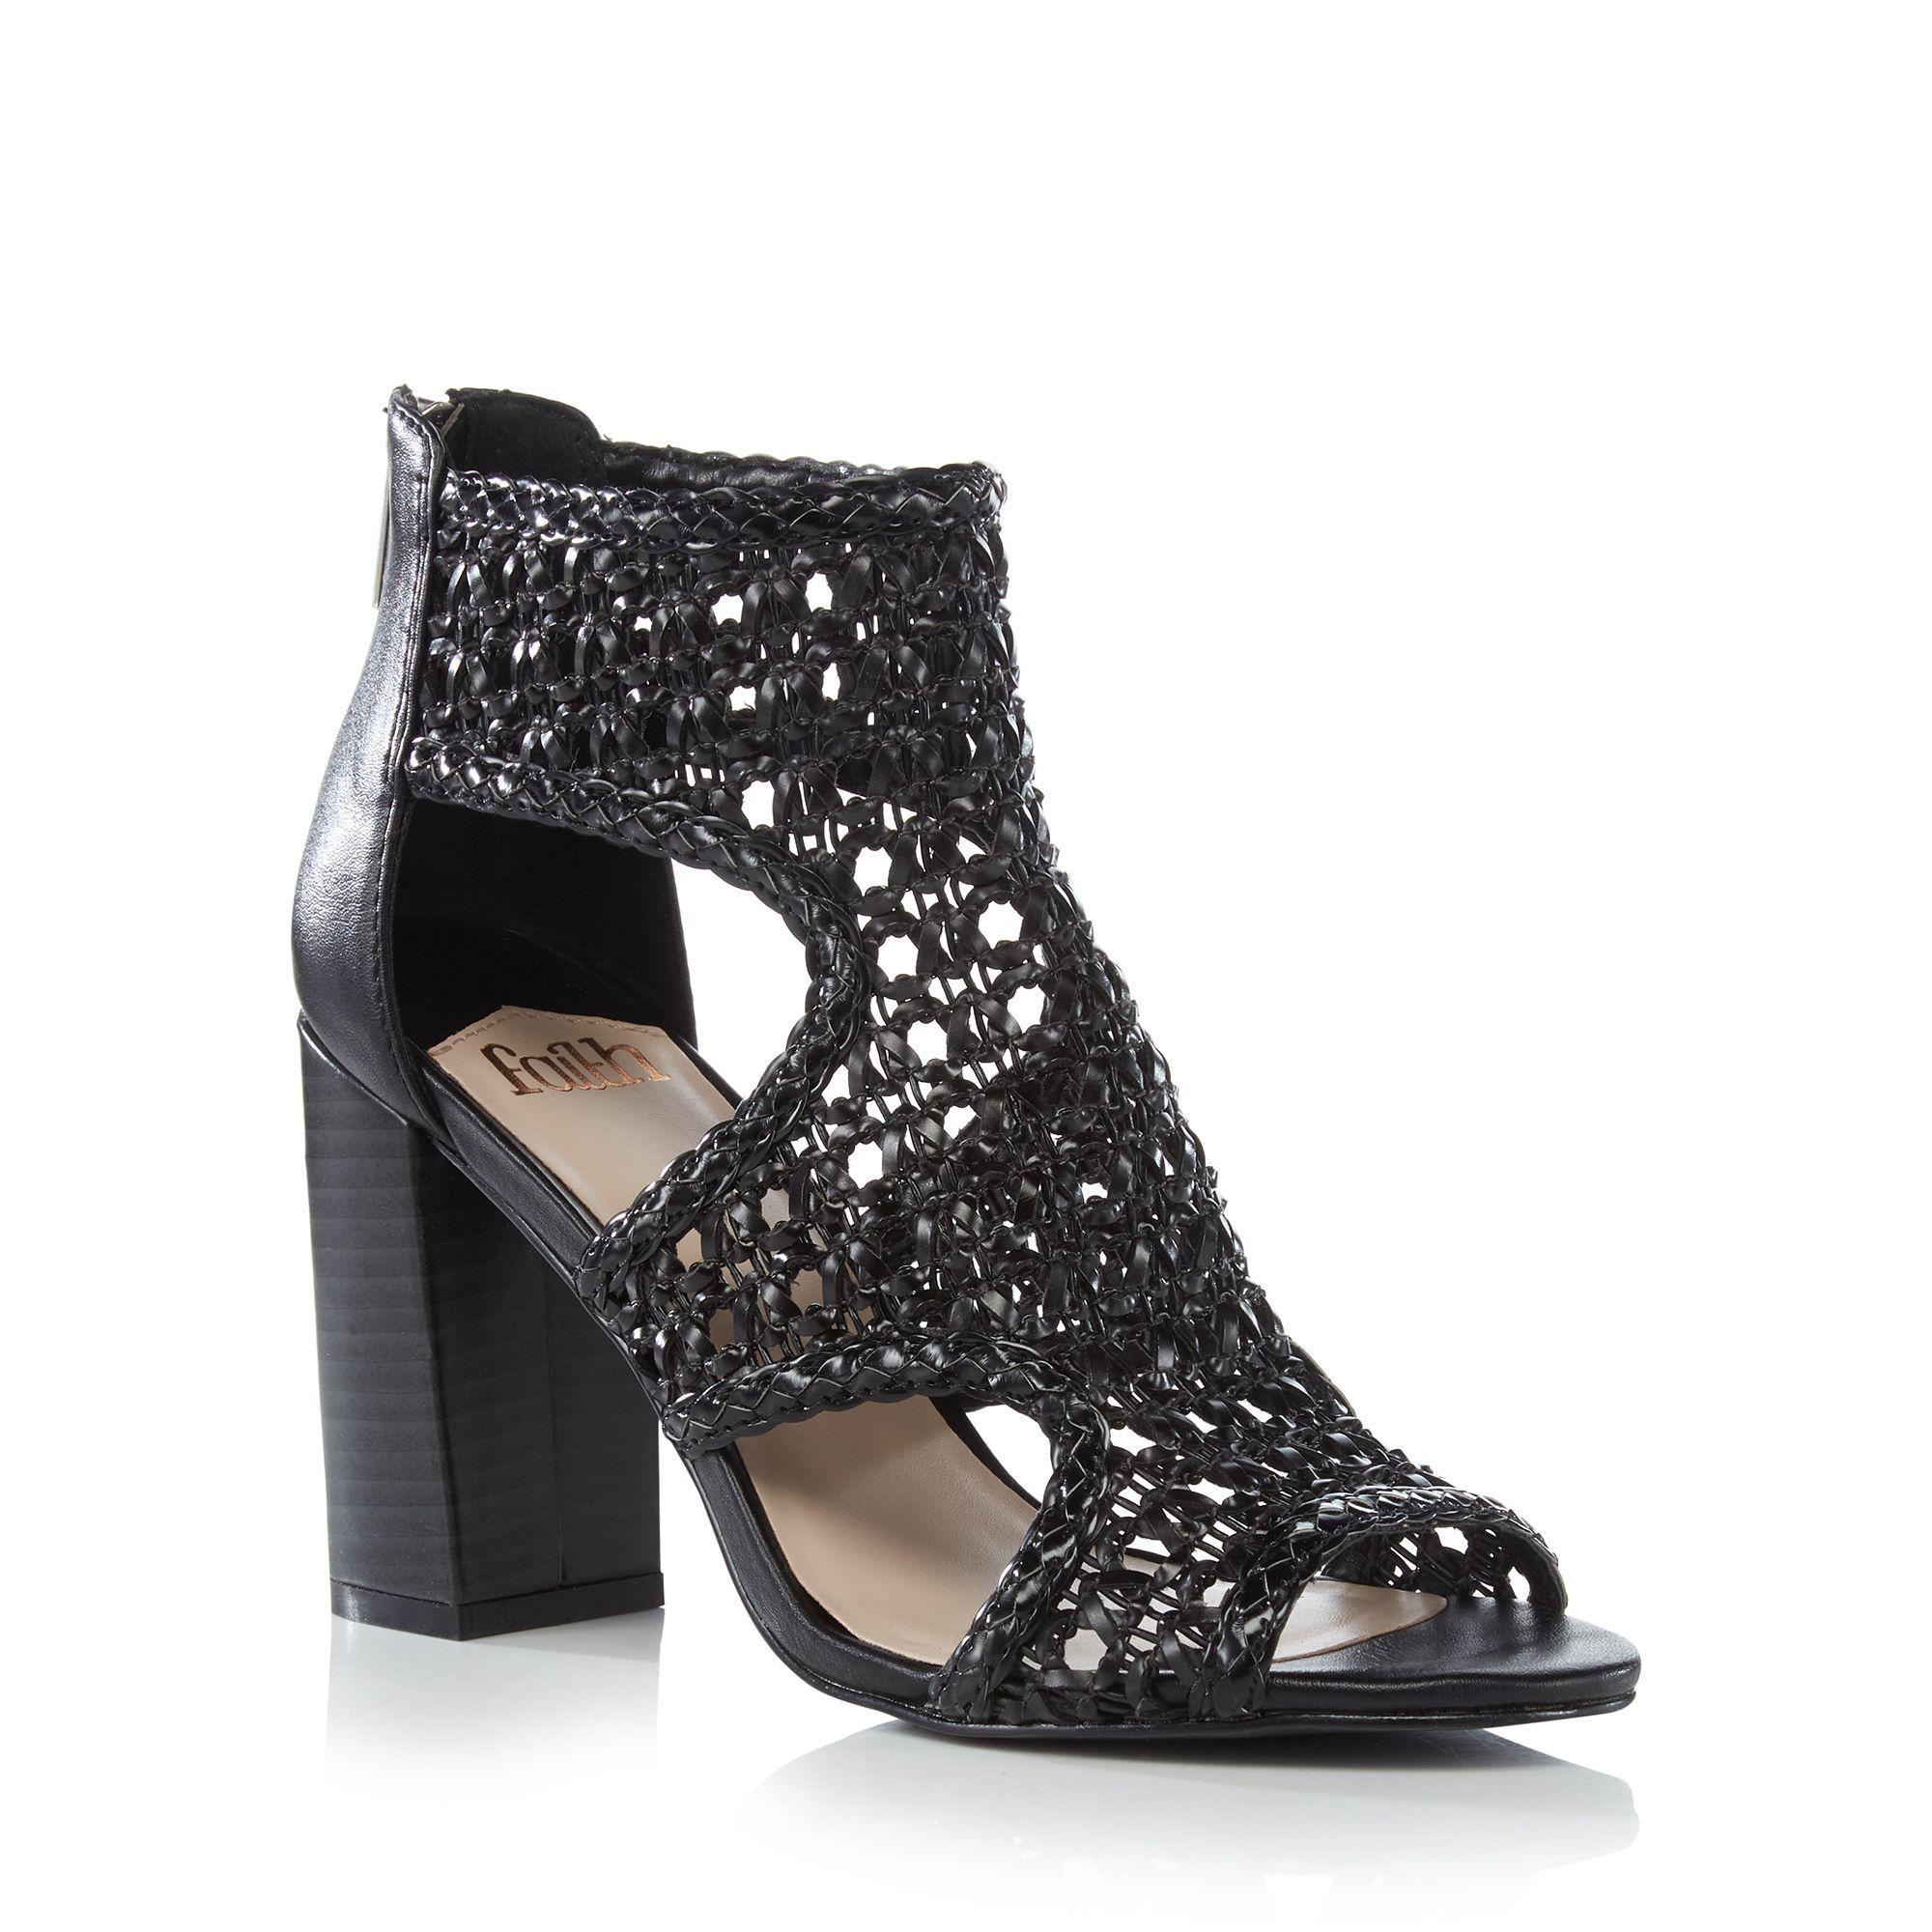 7a843de636 Faith Black Net 'leave' High Block Heel Sandals in Black - Lyst